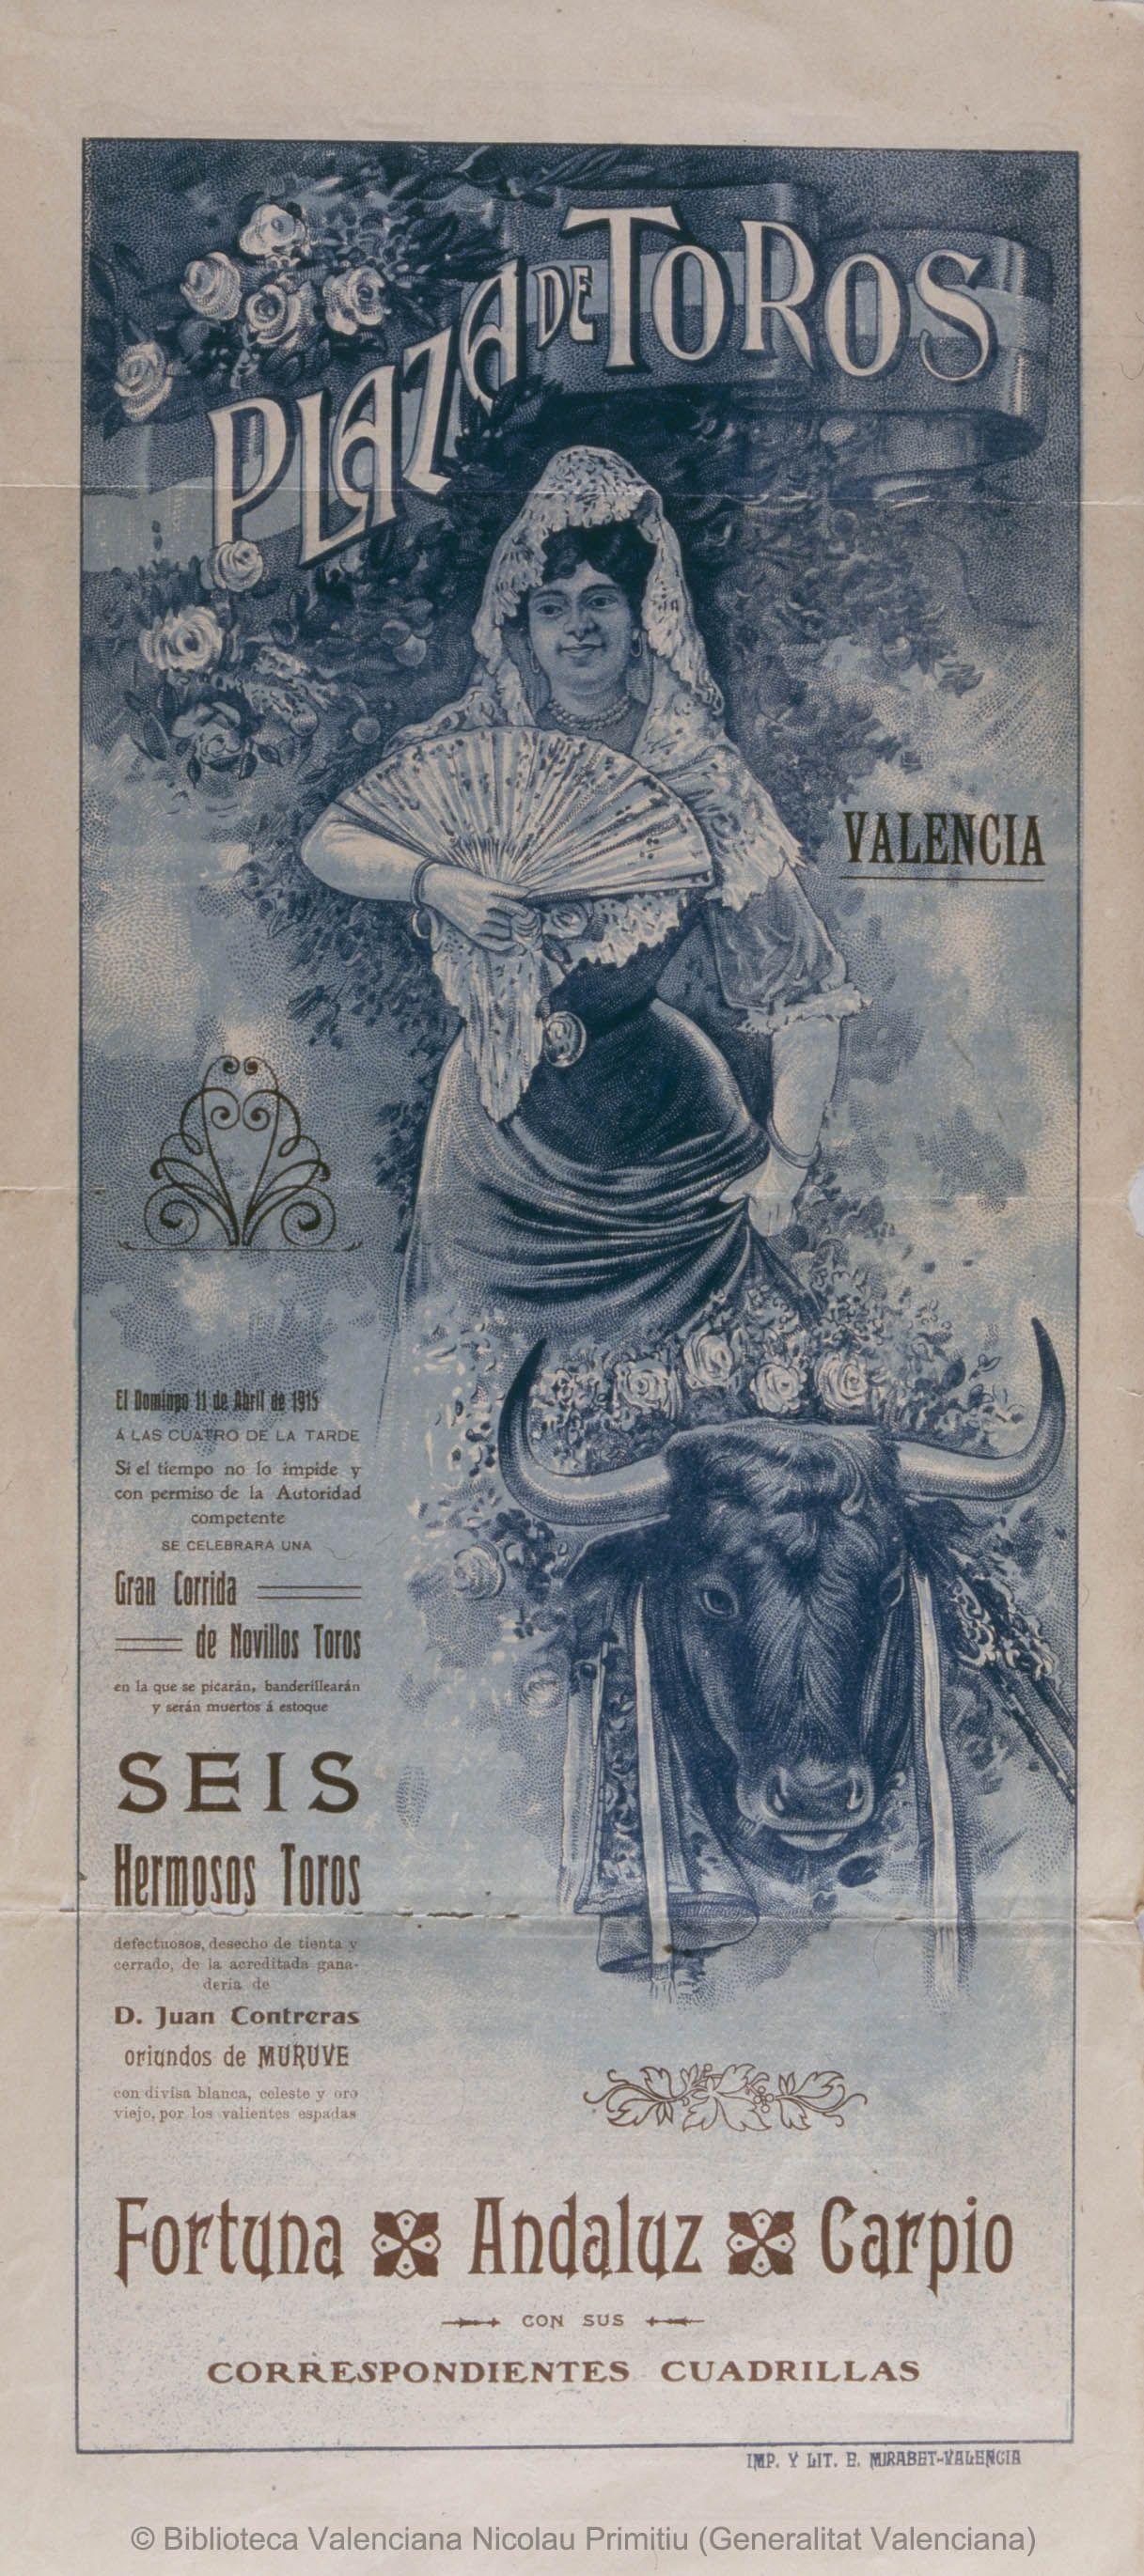 Anónimo. (S. XX)   Plaza de Toros Valencia [Material gráfico] : El Domingo 11 de Abril de 1915 ... : Gran corrida de novillos toros ... — [S.l. : s.n., 1915?] (Valencia : Imp. y Lit. E. Mirabet)  lám. (cartel) : col. ; 49 x 22 cm